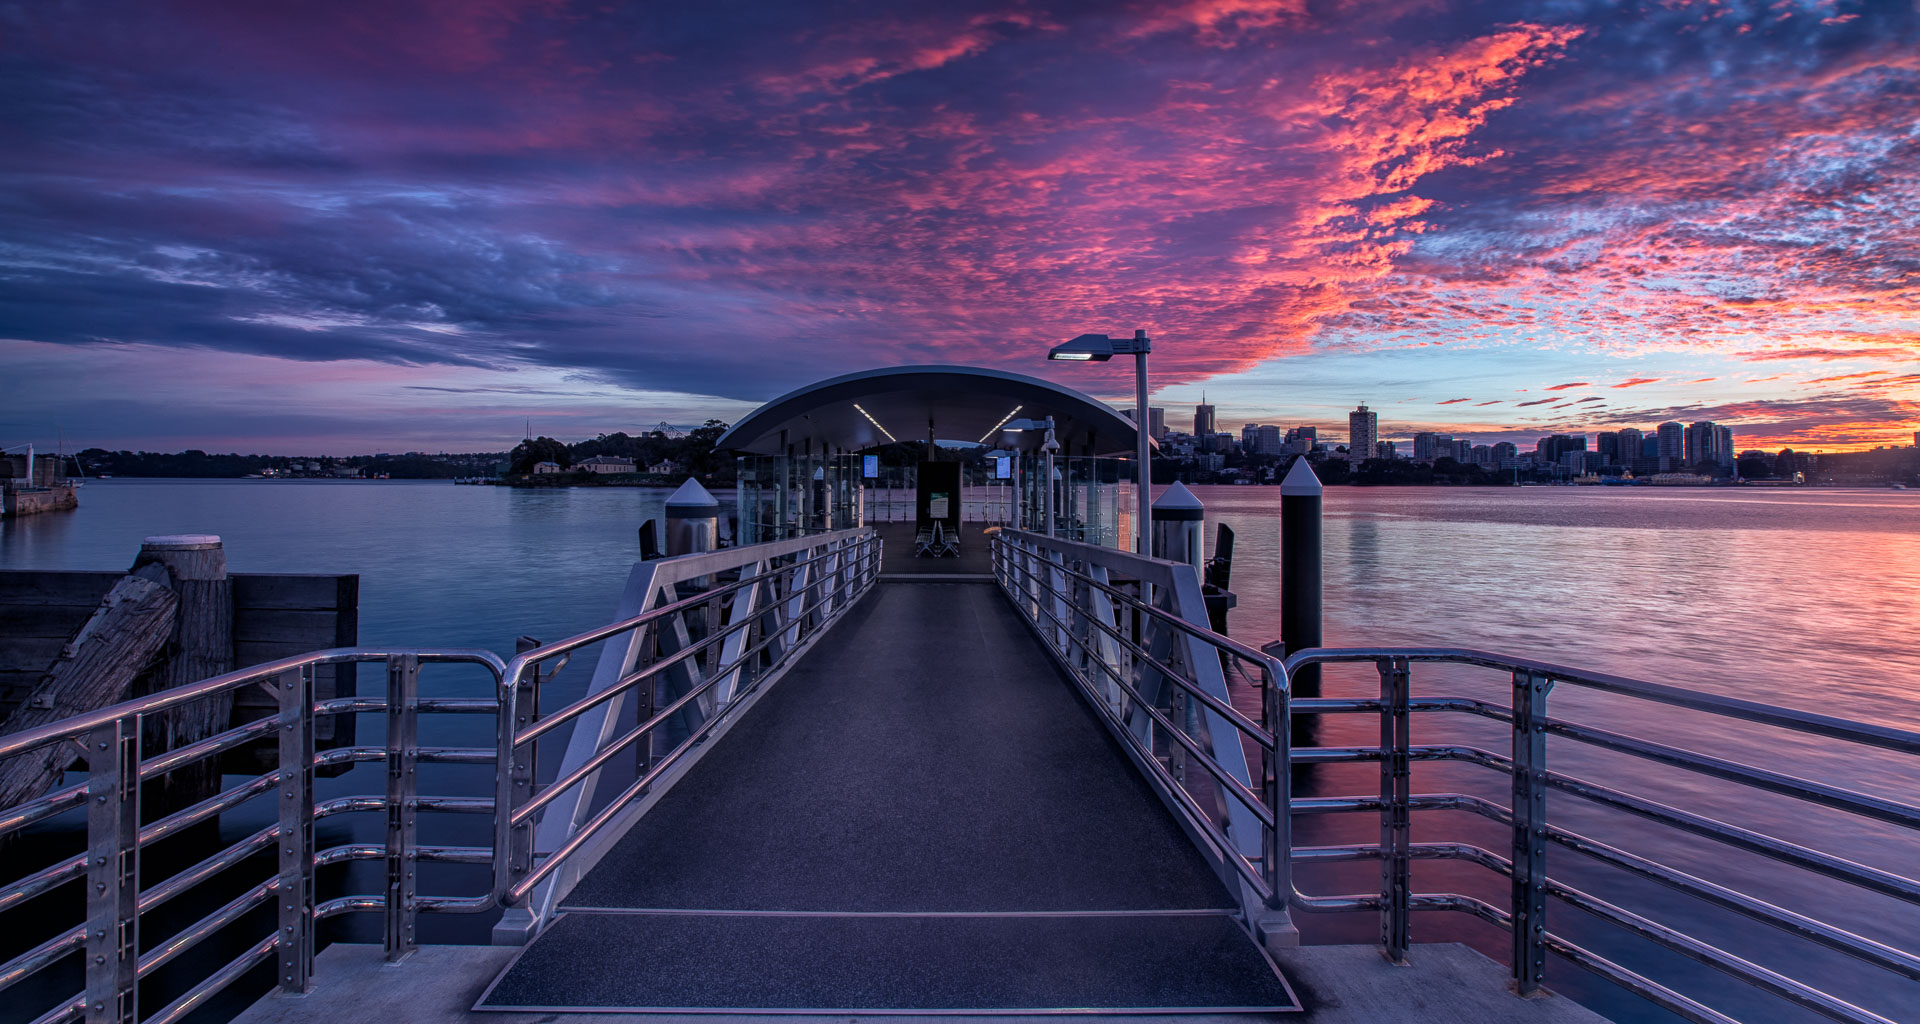 (c) Jacci SchippBenz: Sydney Sunrise